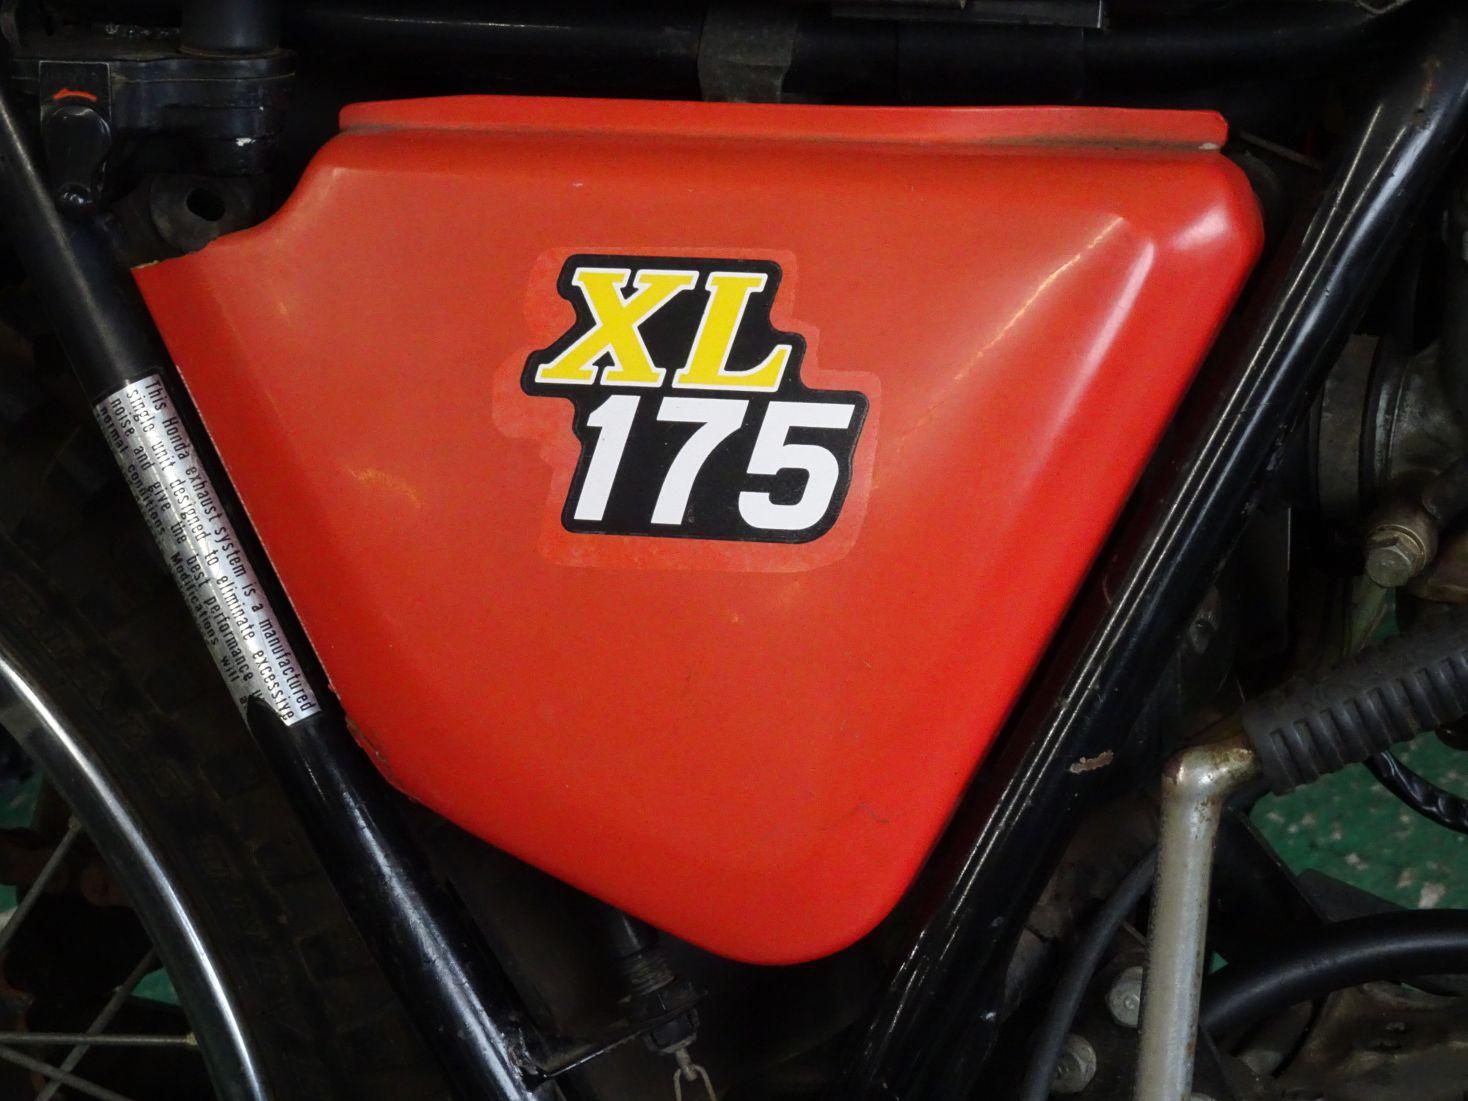 XL175